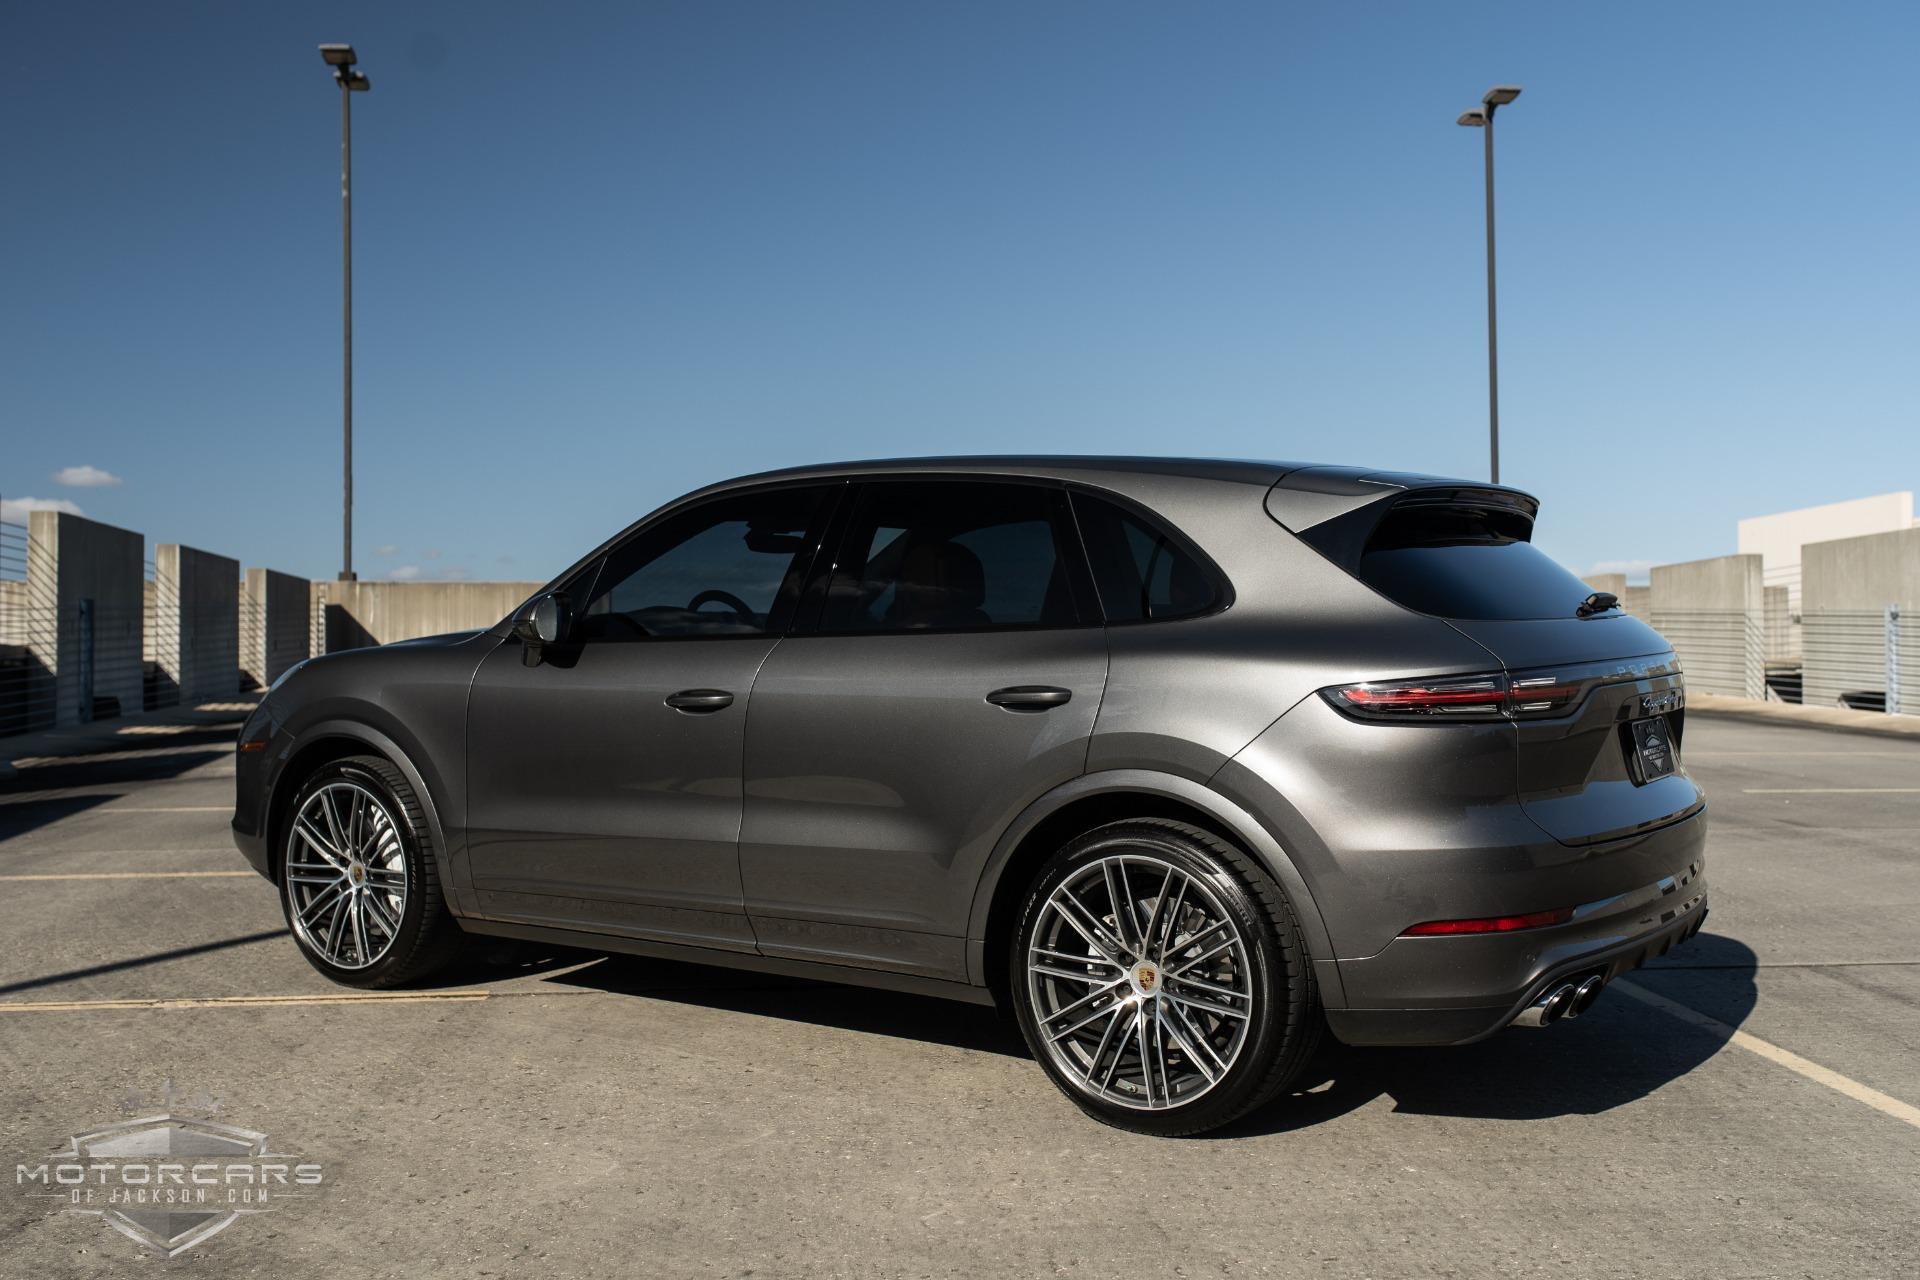 Used-2019-Porsche-Cayenne-Turbo-Jackson-MS